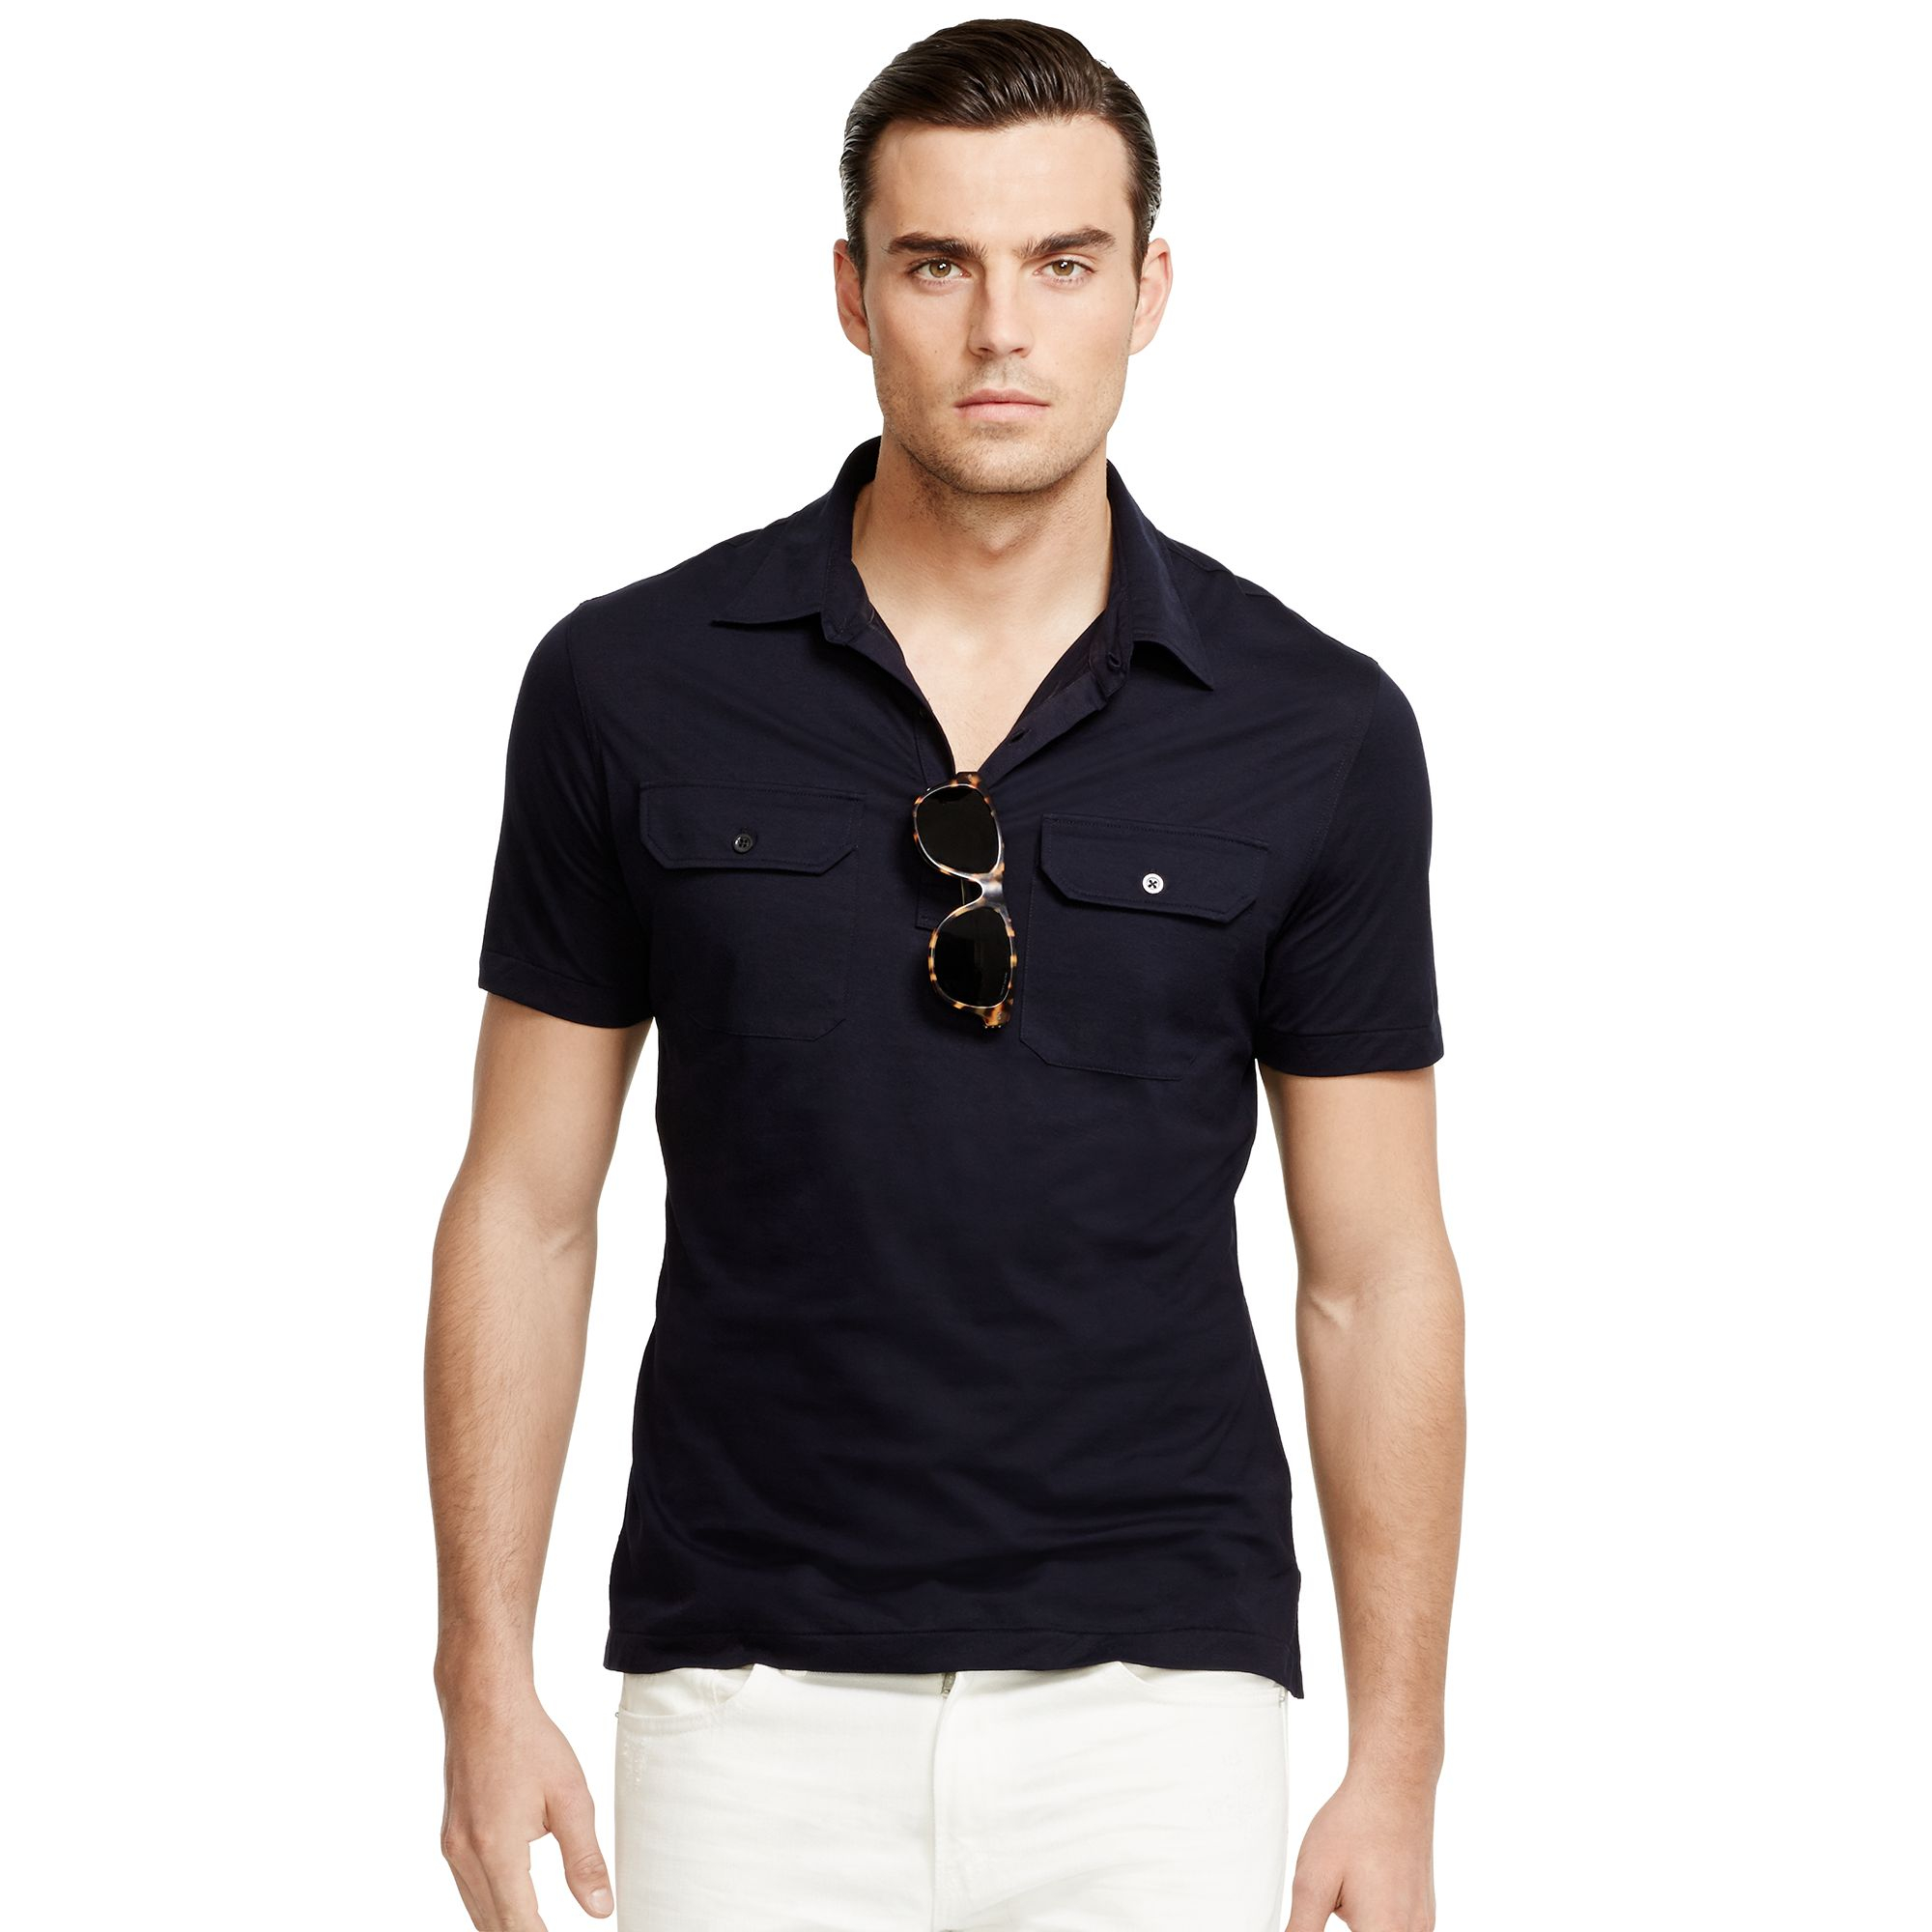 Ralph lauren black label military polo shirt in blue for for Ralph lauren black label polo shirt